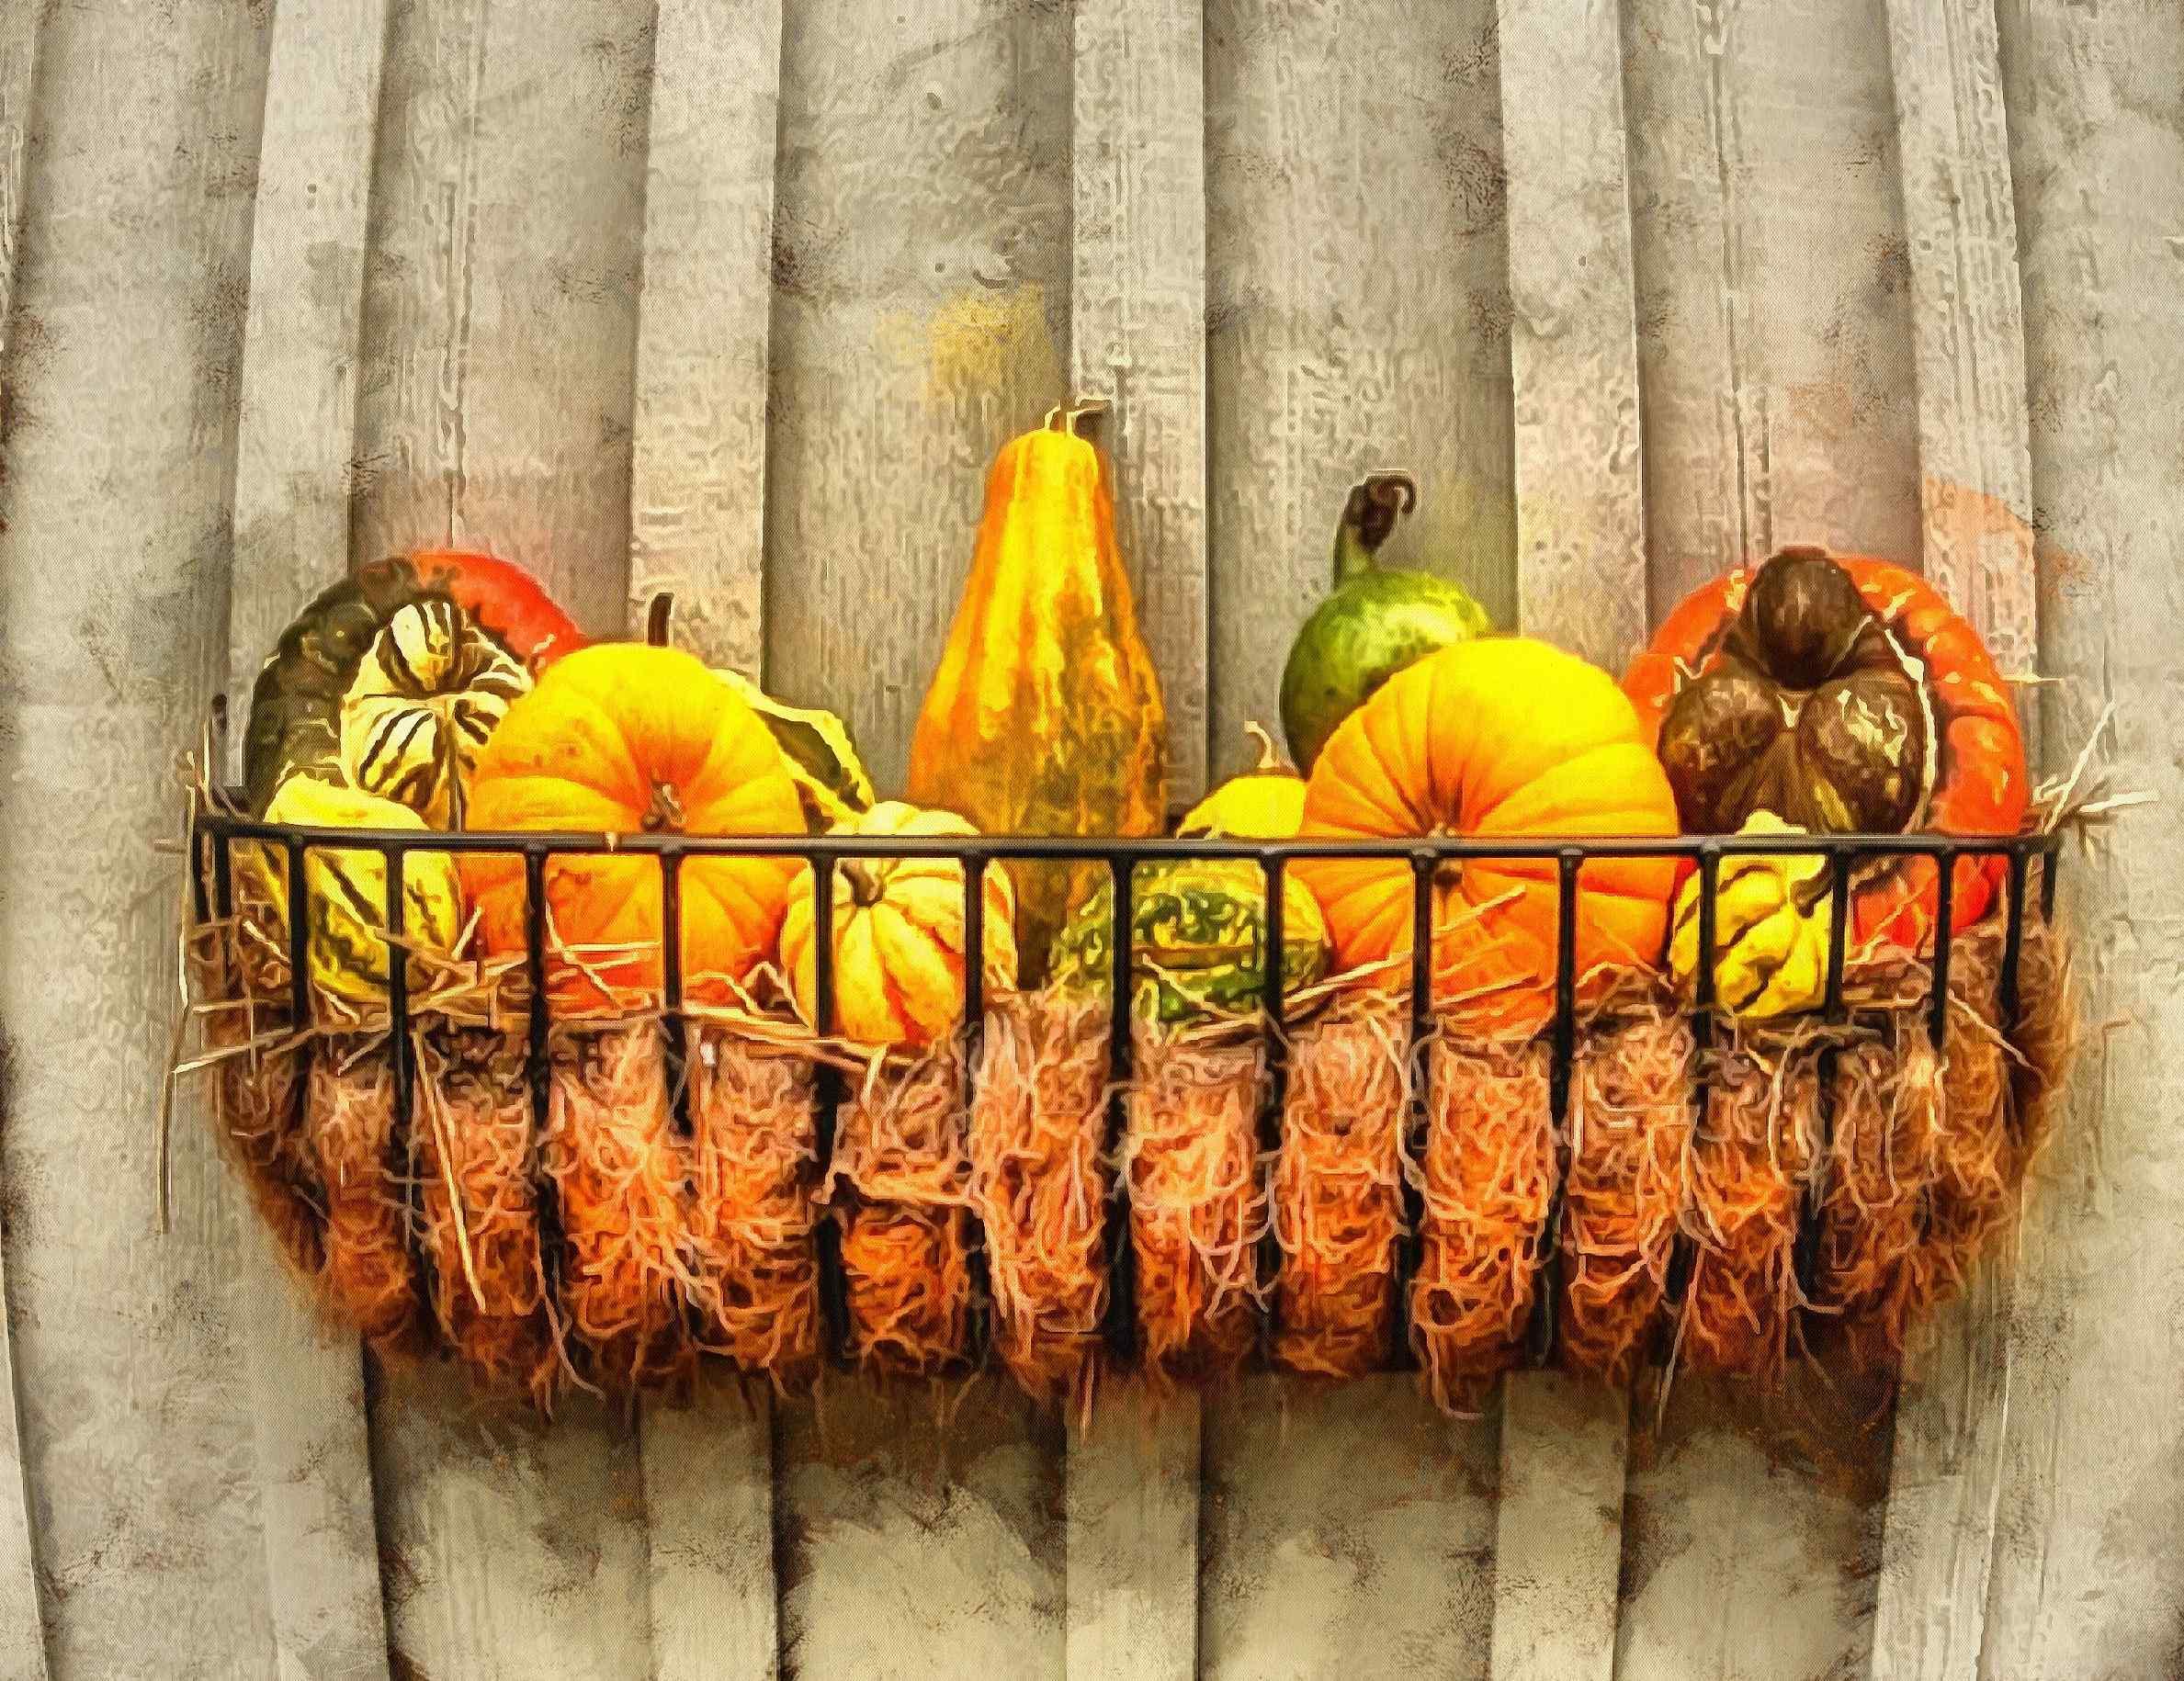 pumpkin, thanksgiving, vegetables, harvest, holiday, - thanksgiving, stock free image, public domain photos, free stock photo, download public domain images.